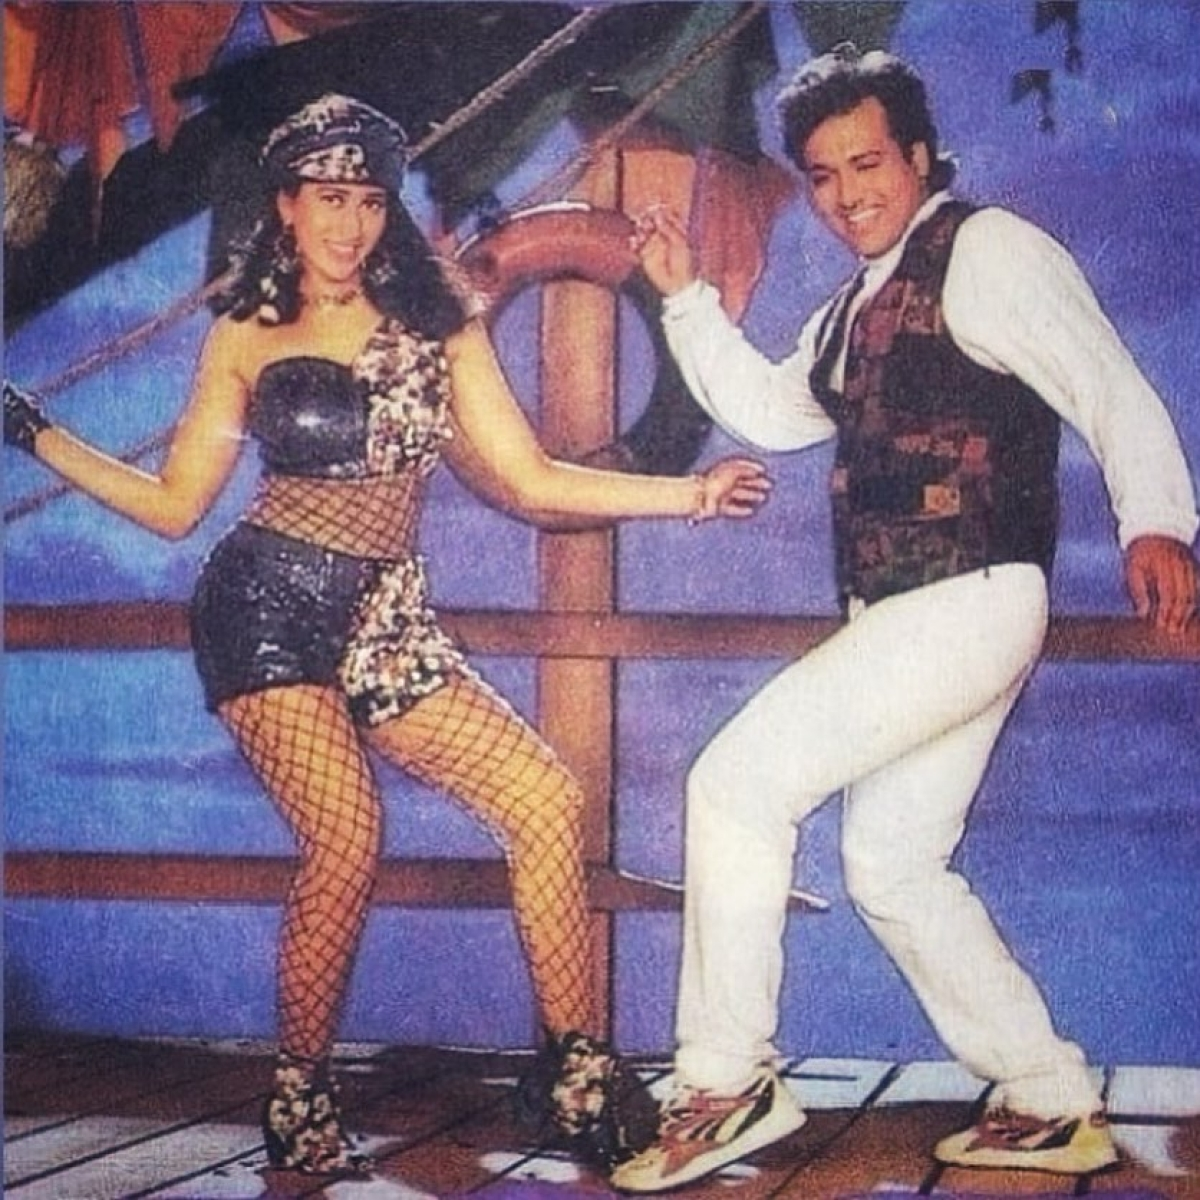 Flashback Friday: Karisma Kapoor reminisces first dance number with Govinda from 'Coolie No. 1'